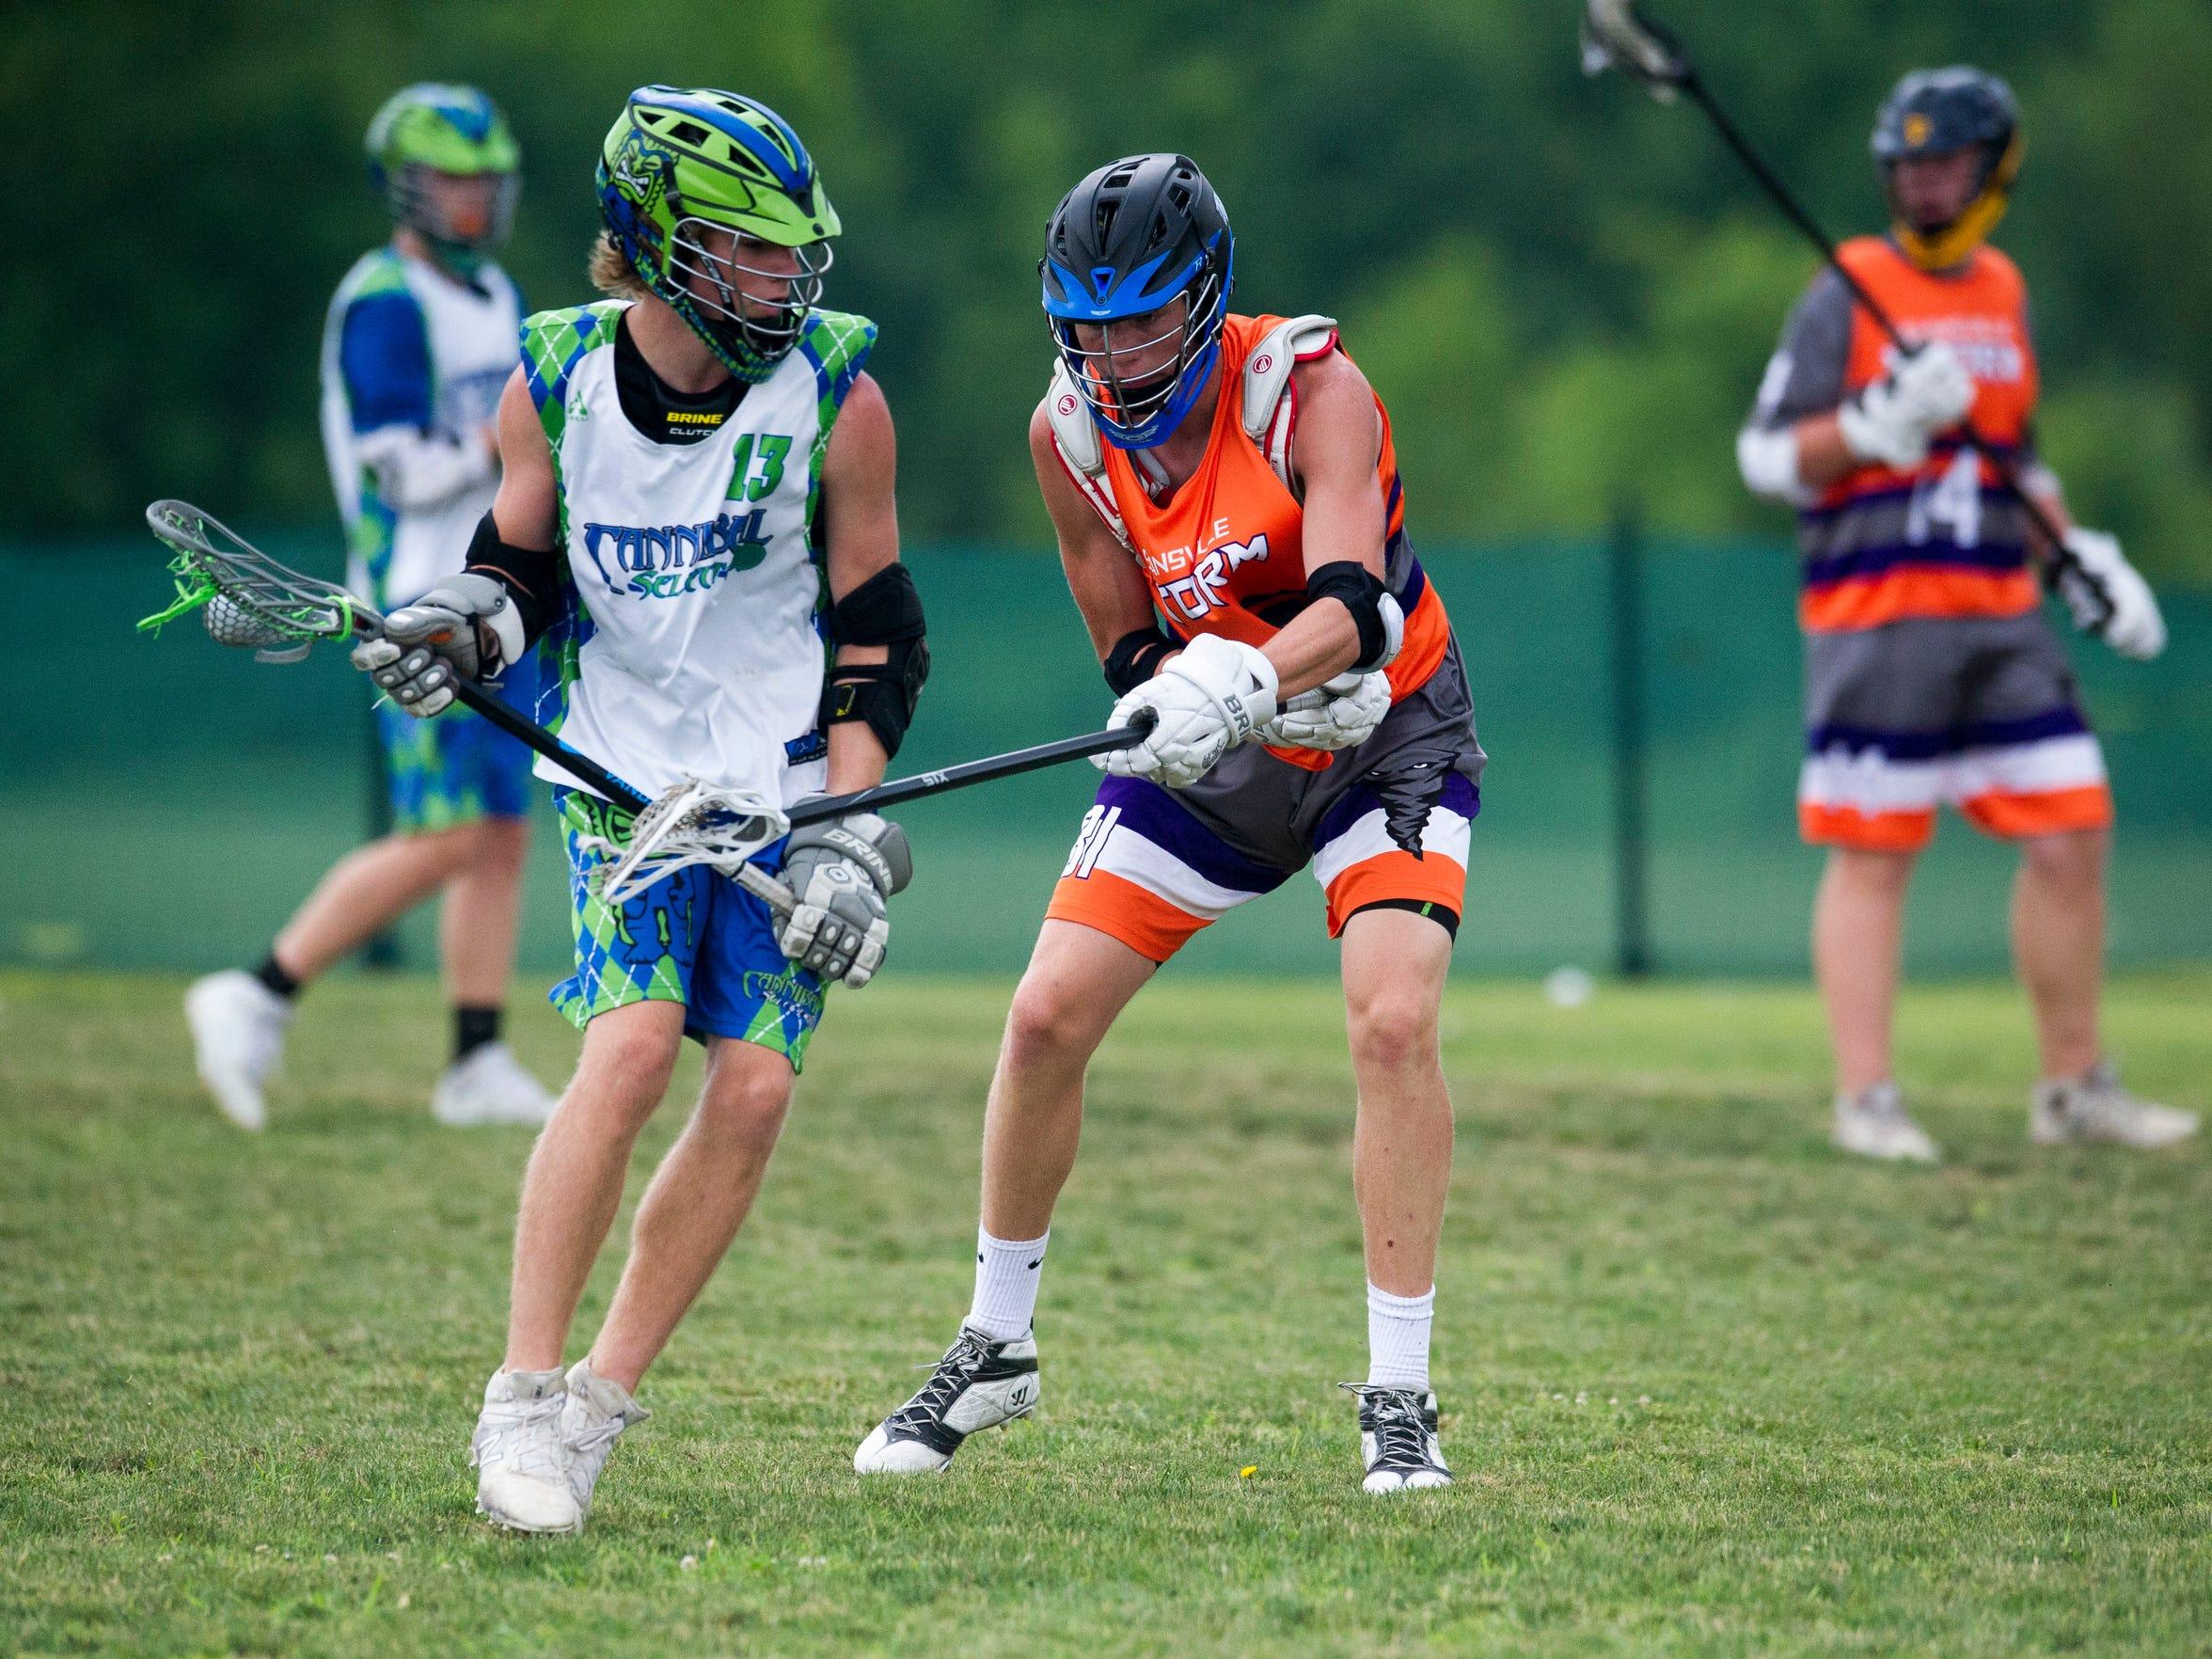 Eville Storm U19's Joseph W. stick checks a Cannibal High School player during the 2018 Thunderbolt Shootout on Sunday, June 10, 2018.